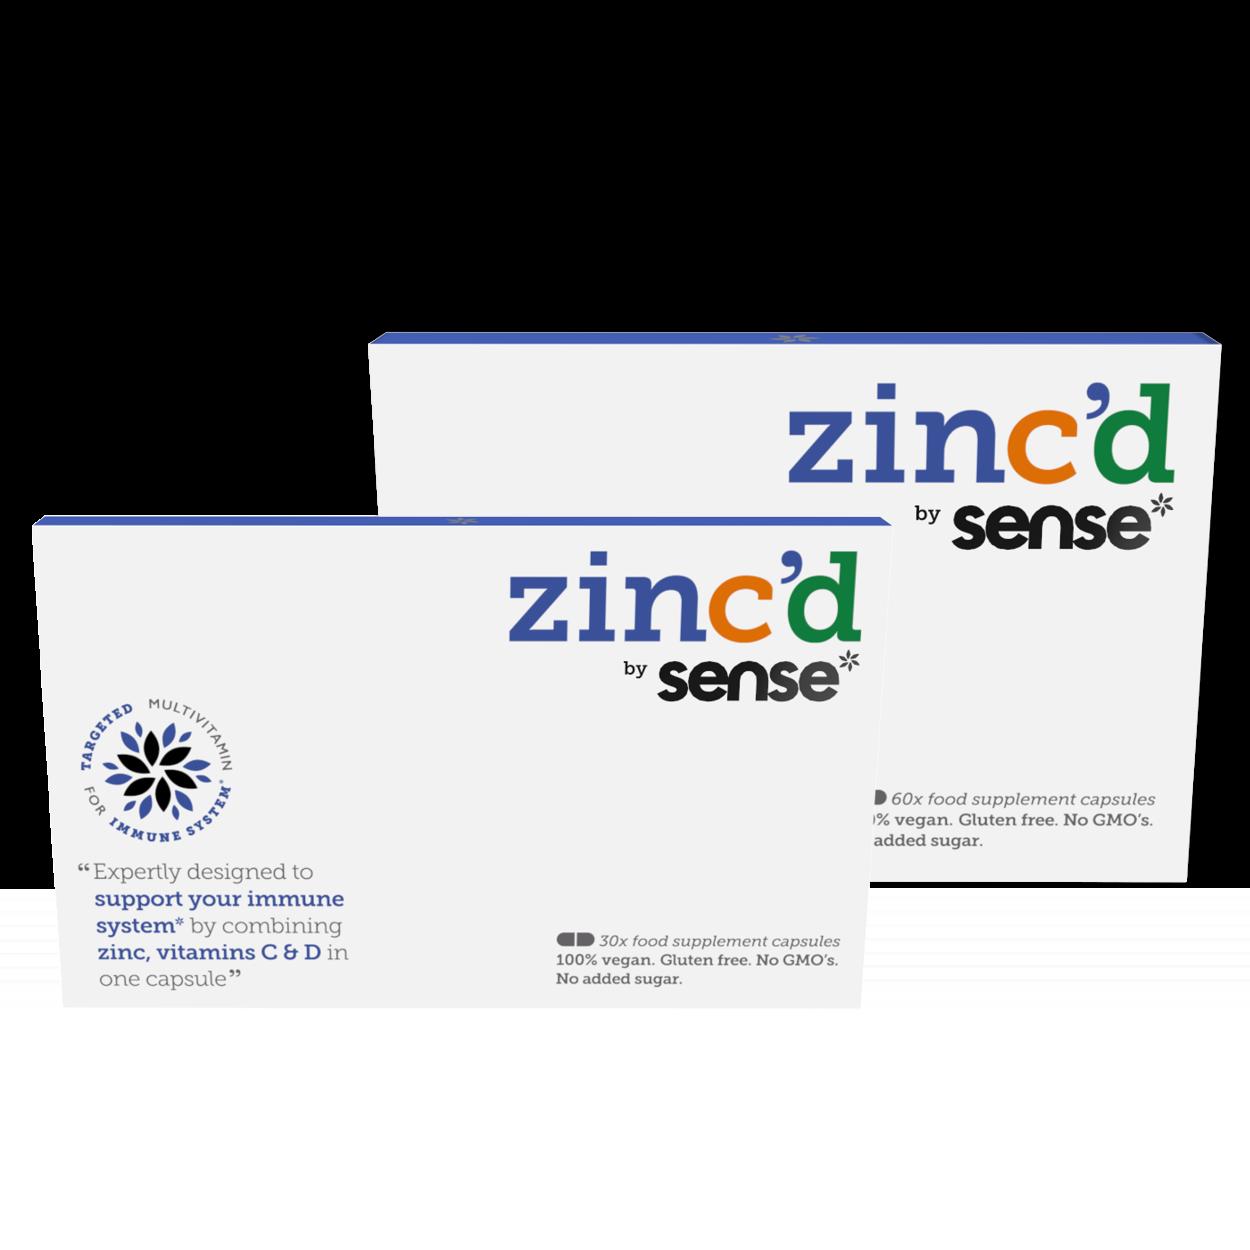 zinc'd by sense* range